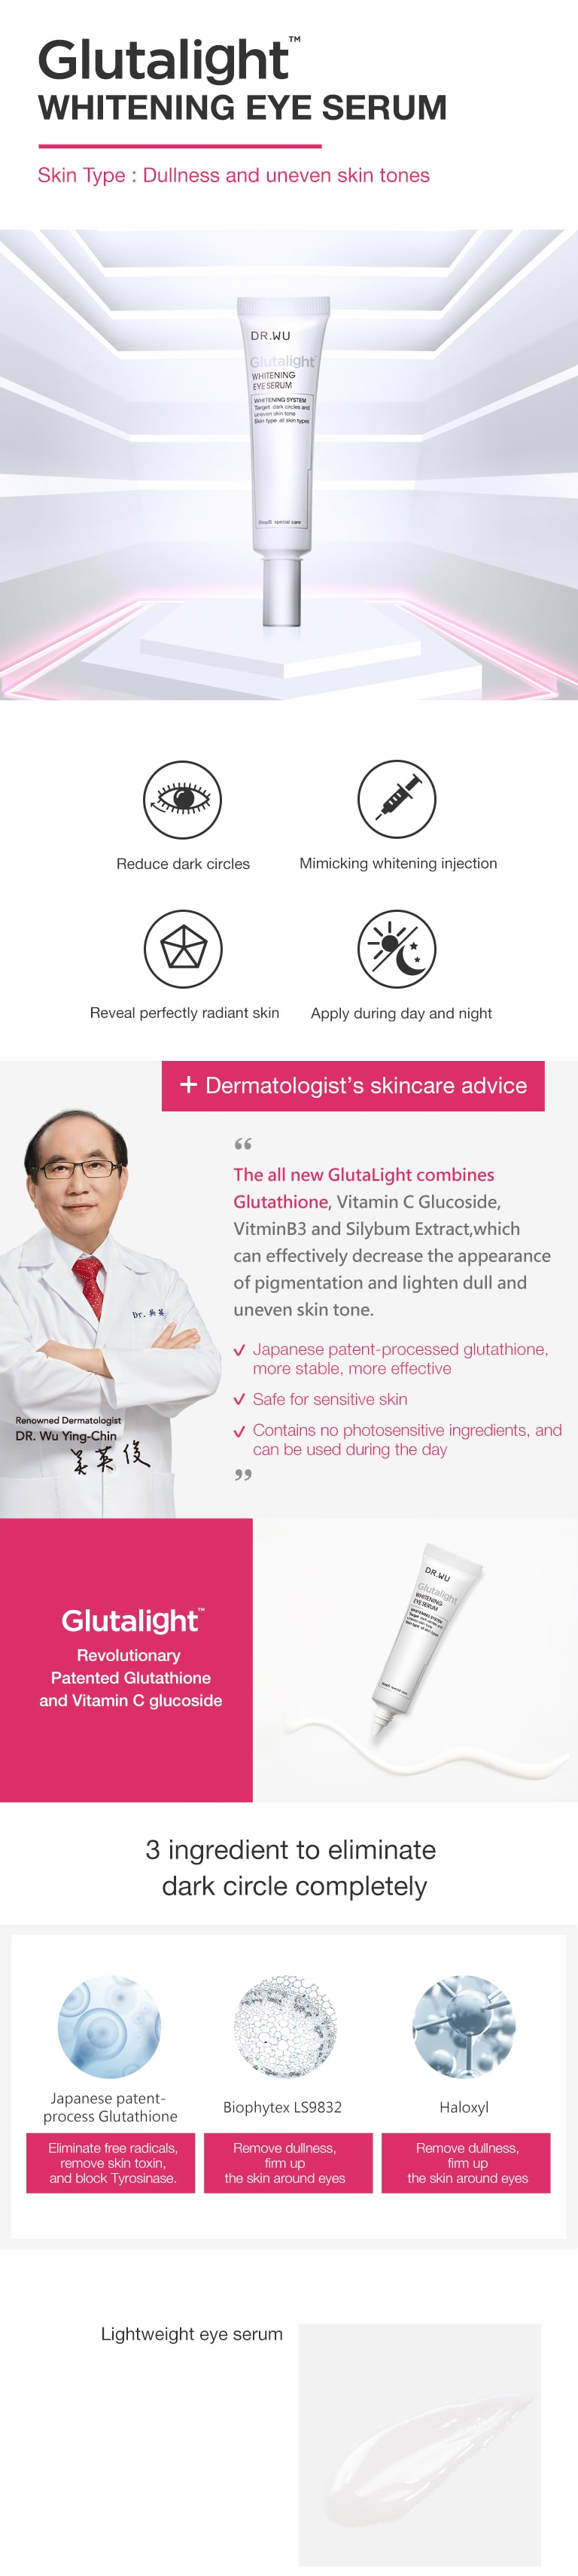 Glutalight Whitening Eye Serum - Introduction